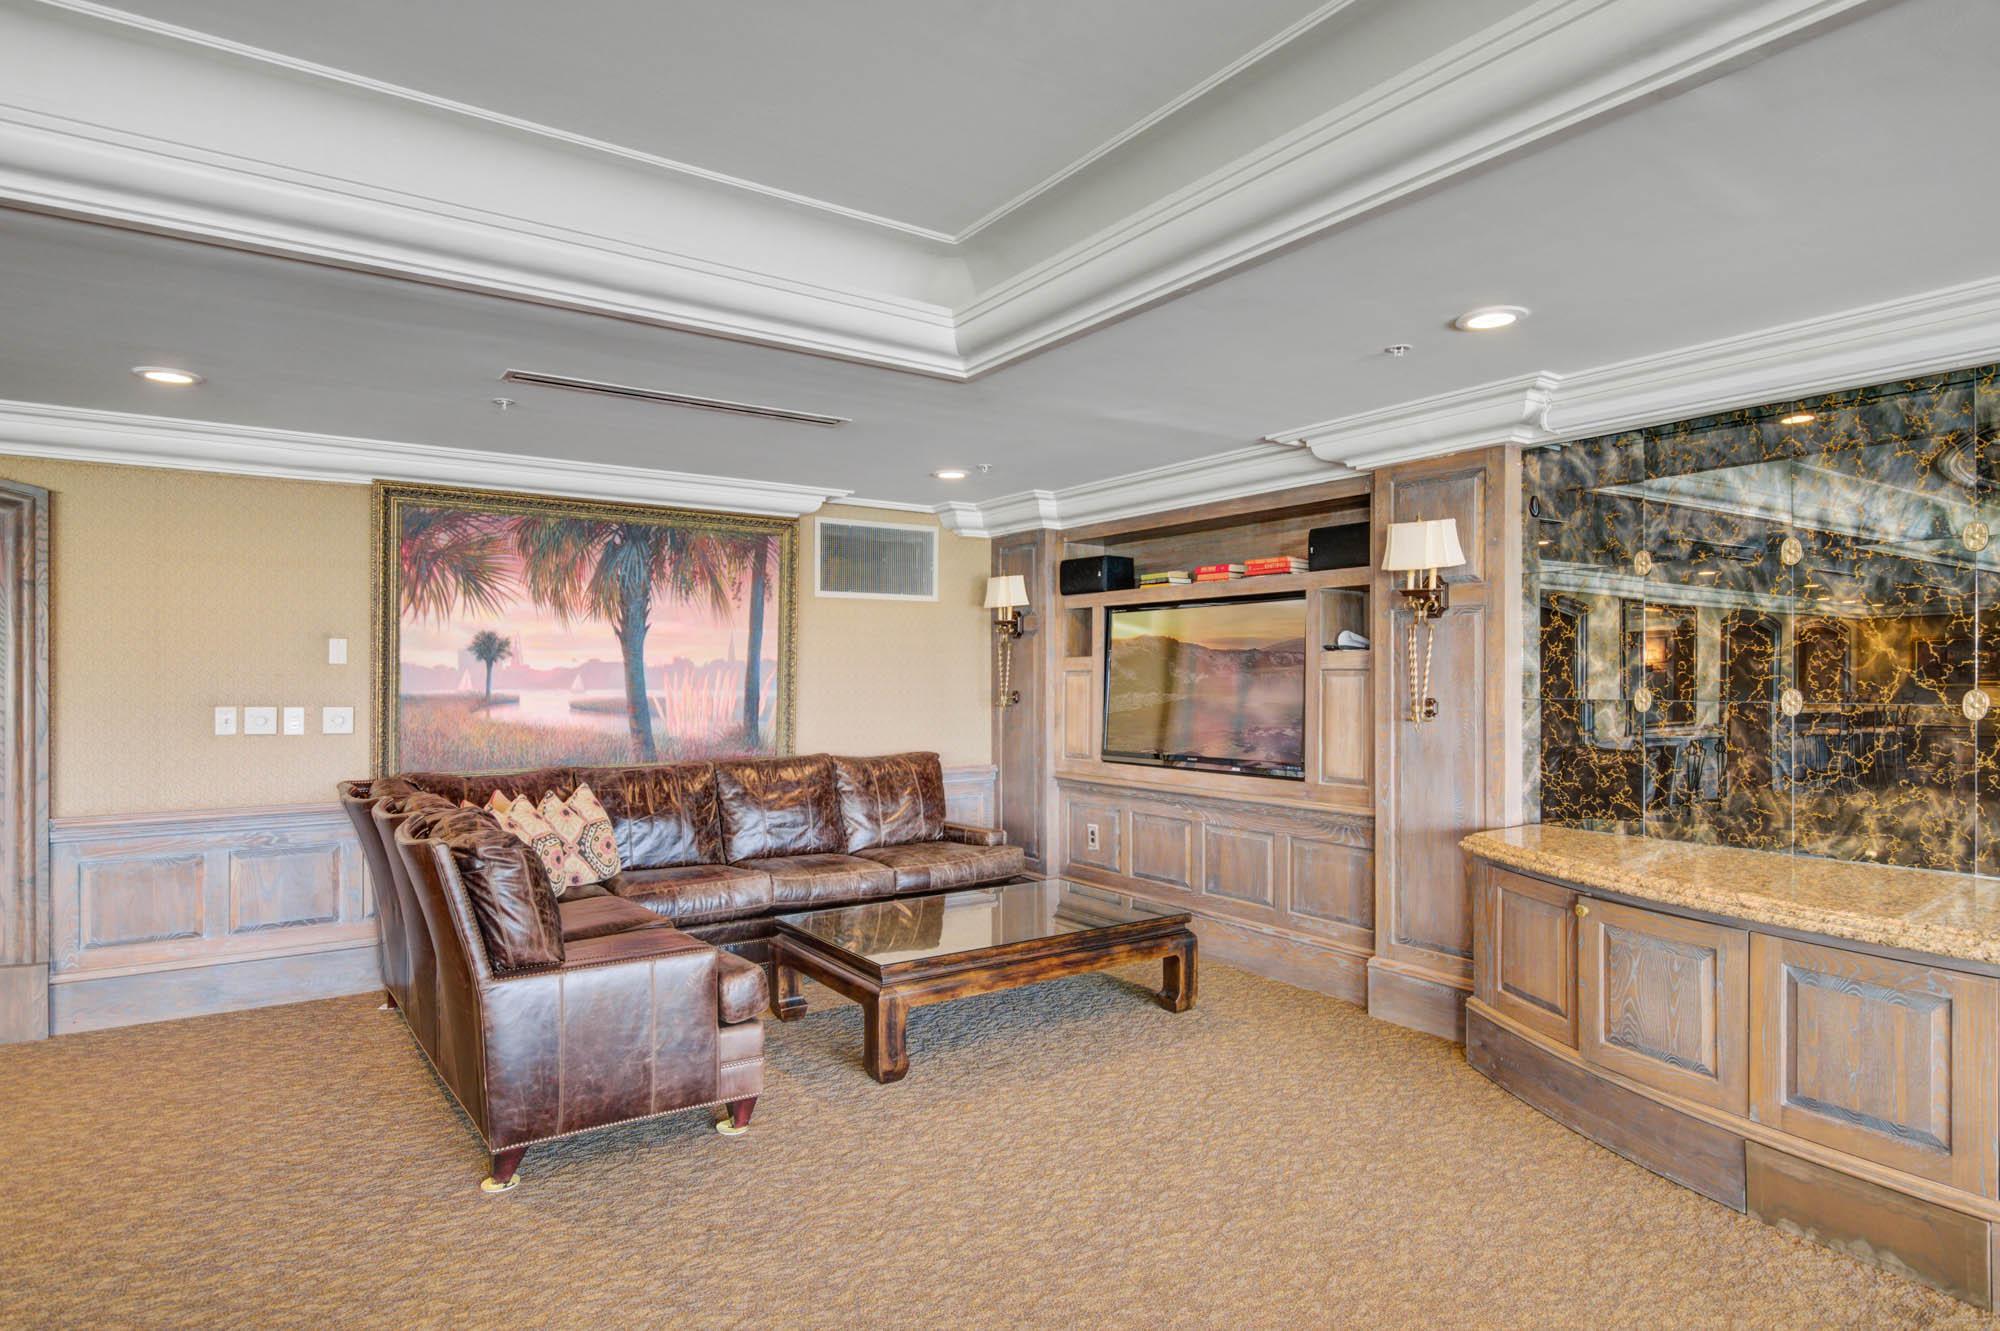 Renaissance On Chas Harbor Homes For Sale - 125 Plaza, Mount Pleasant, SC - 10